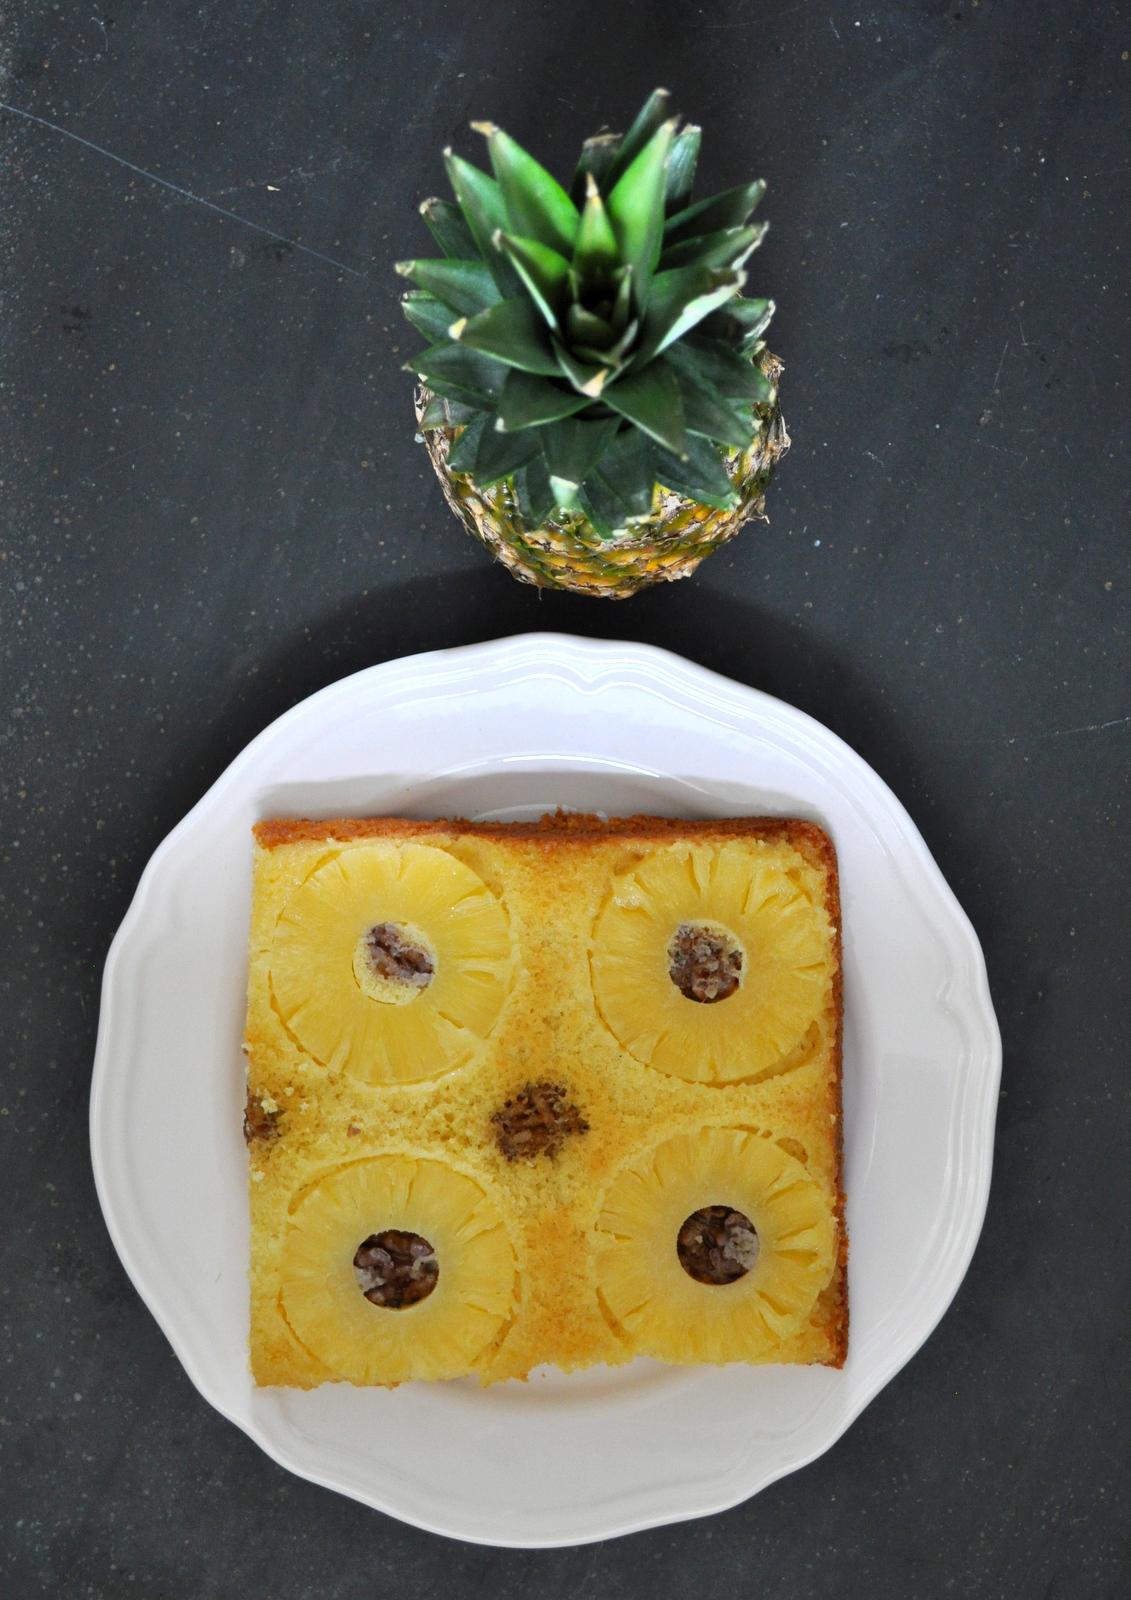 pineappleandwalnutbake 049